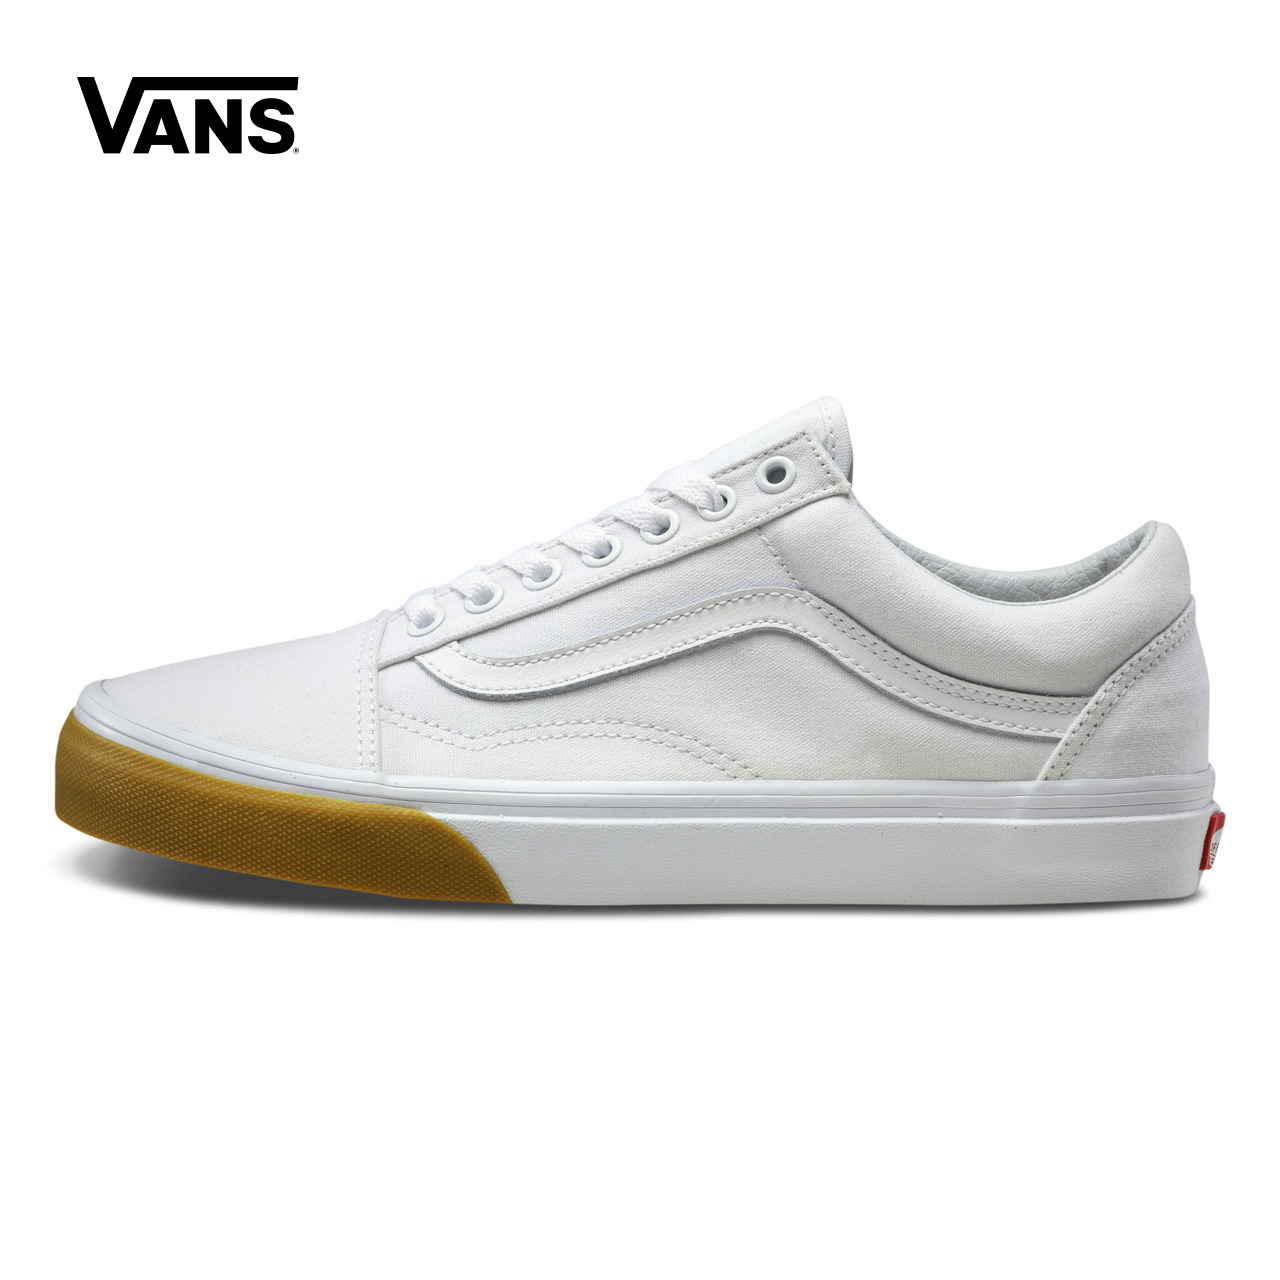 Vans 范斯官方男女款OLD SKOOL板鞋|VN0A38G1Q8R